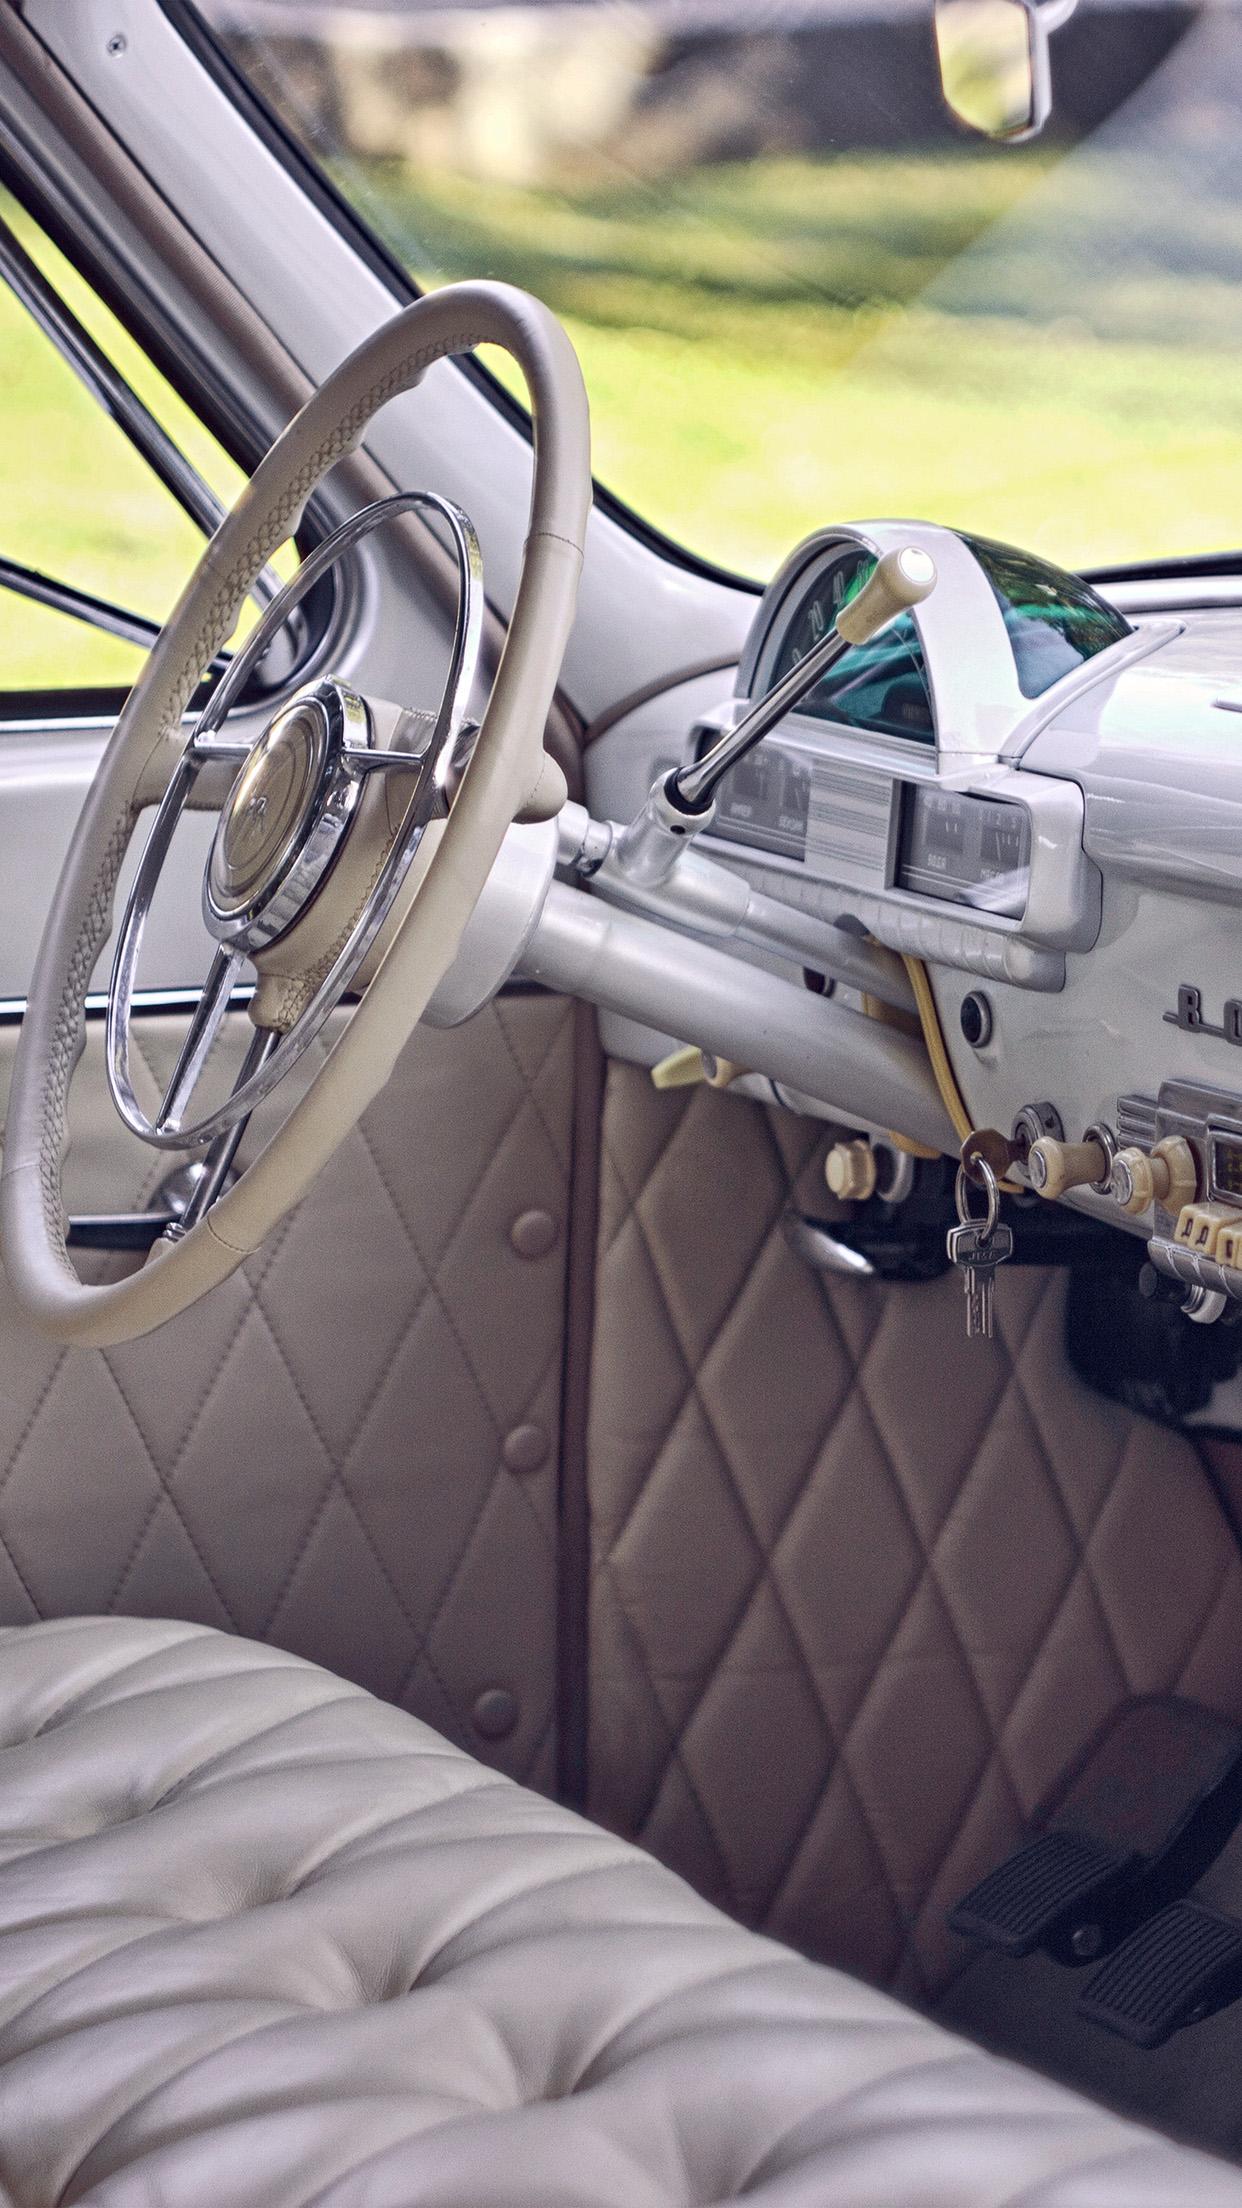 Iphone7papers Com Iphone7 Wallpaper Nb82 Classic Car Drive